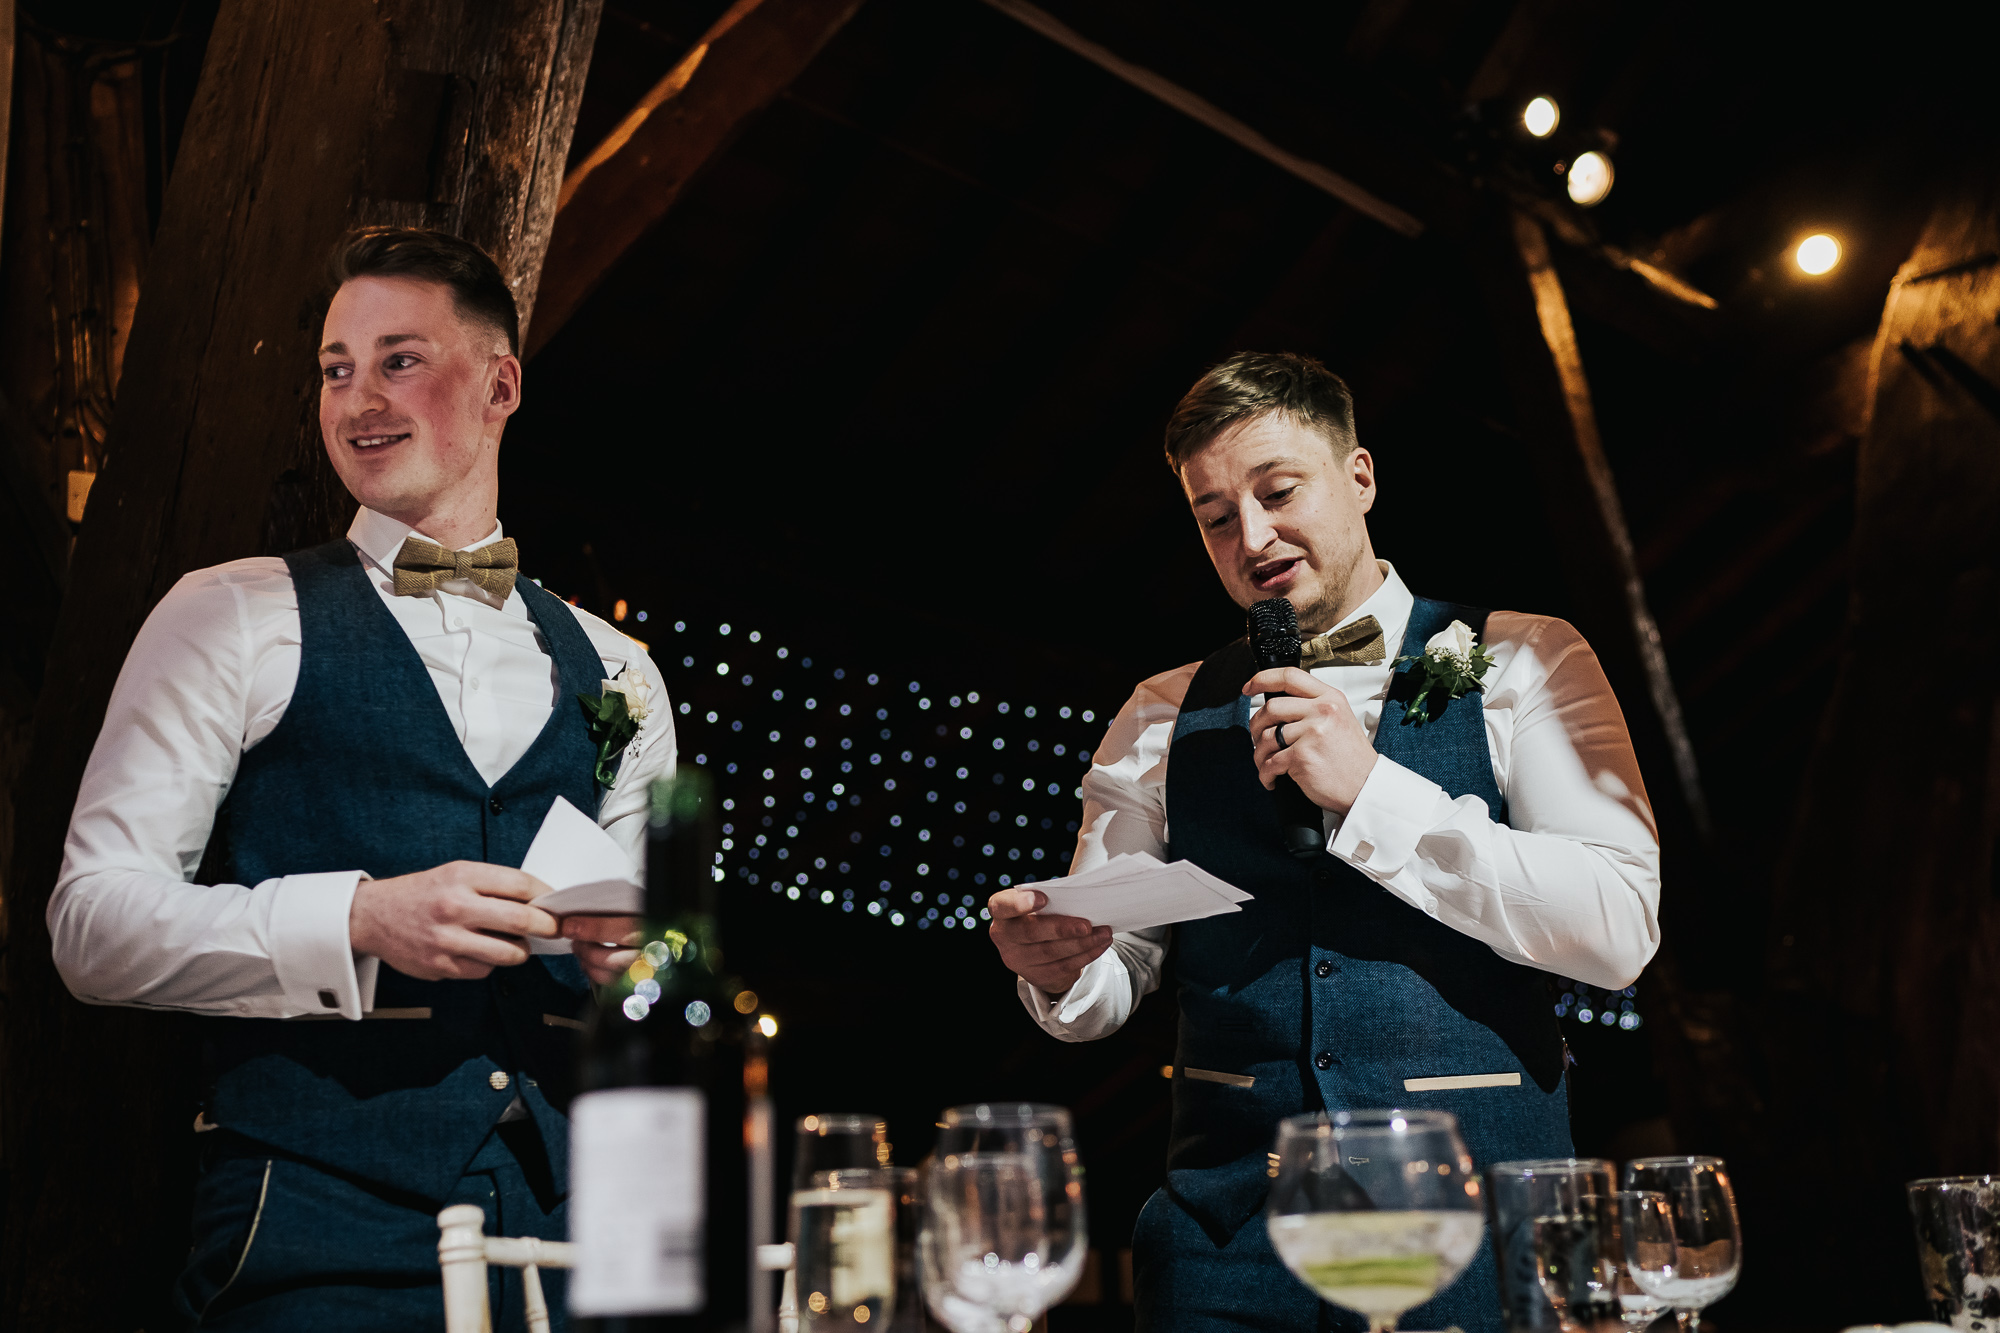 Rivington Hall Barn Wedding PHotographer lancashire wedding photography (28 of 34).jpg